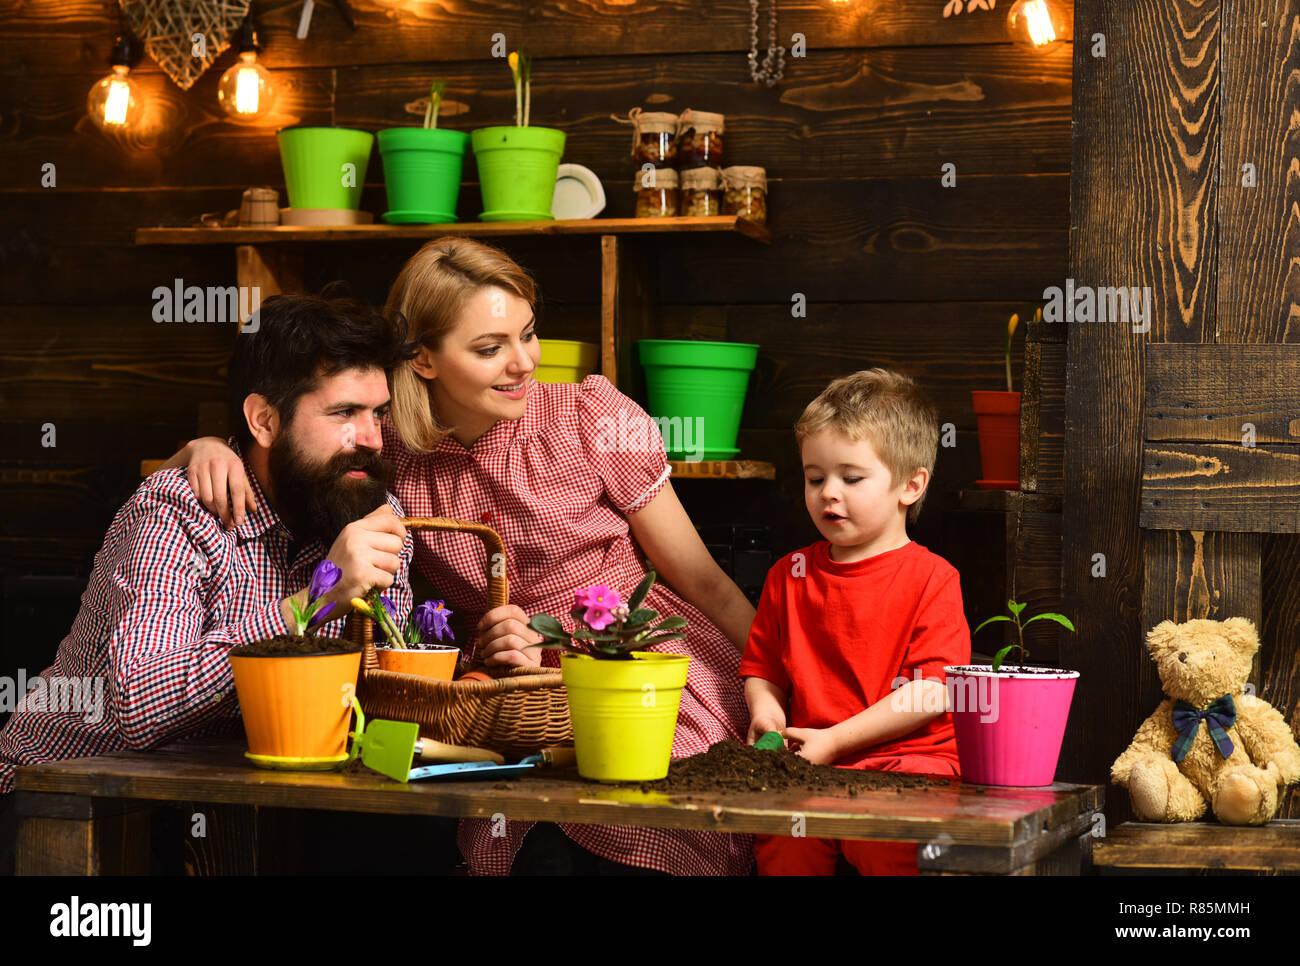 Design concept. Family potting flowers, design. Eco design in home interior. Floral design - Stock Image